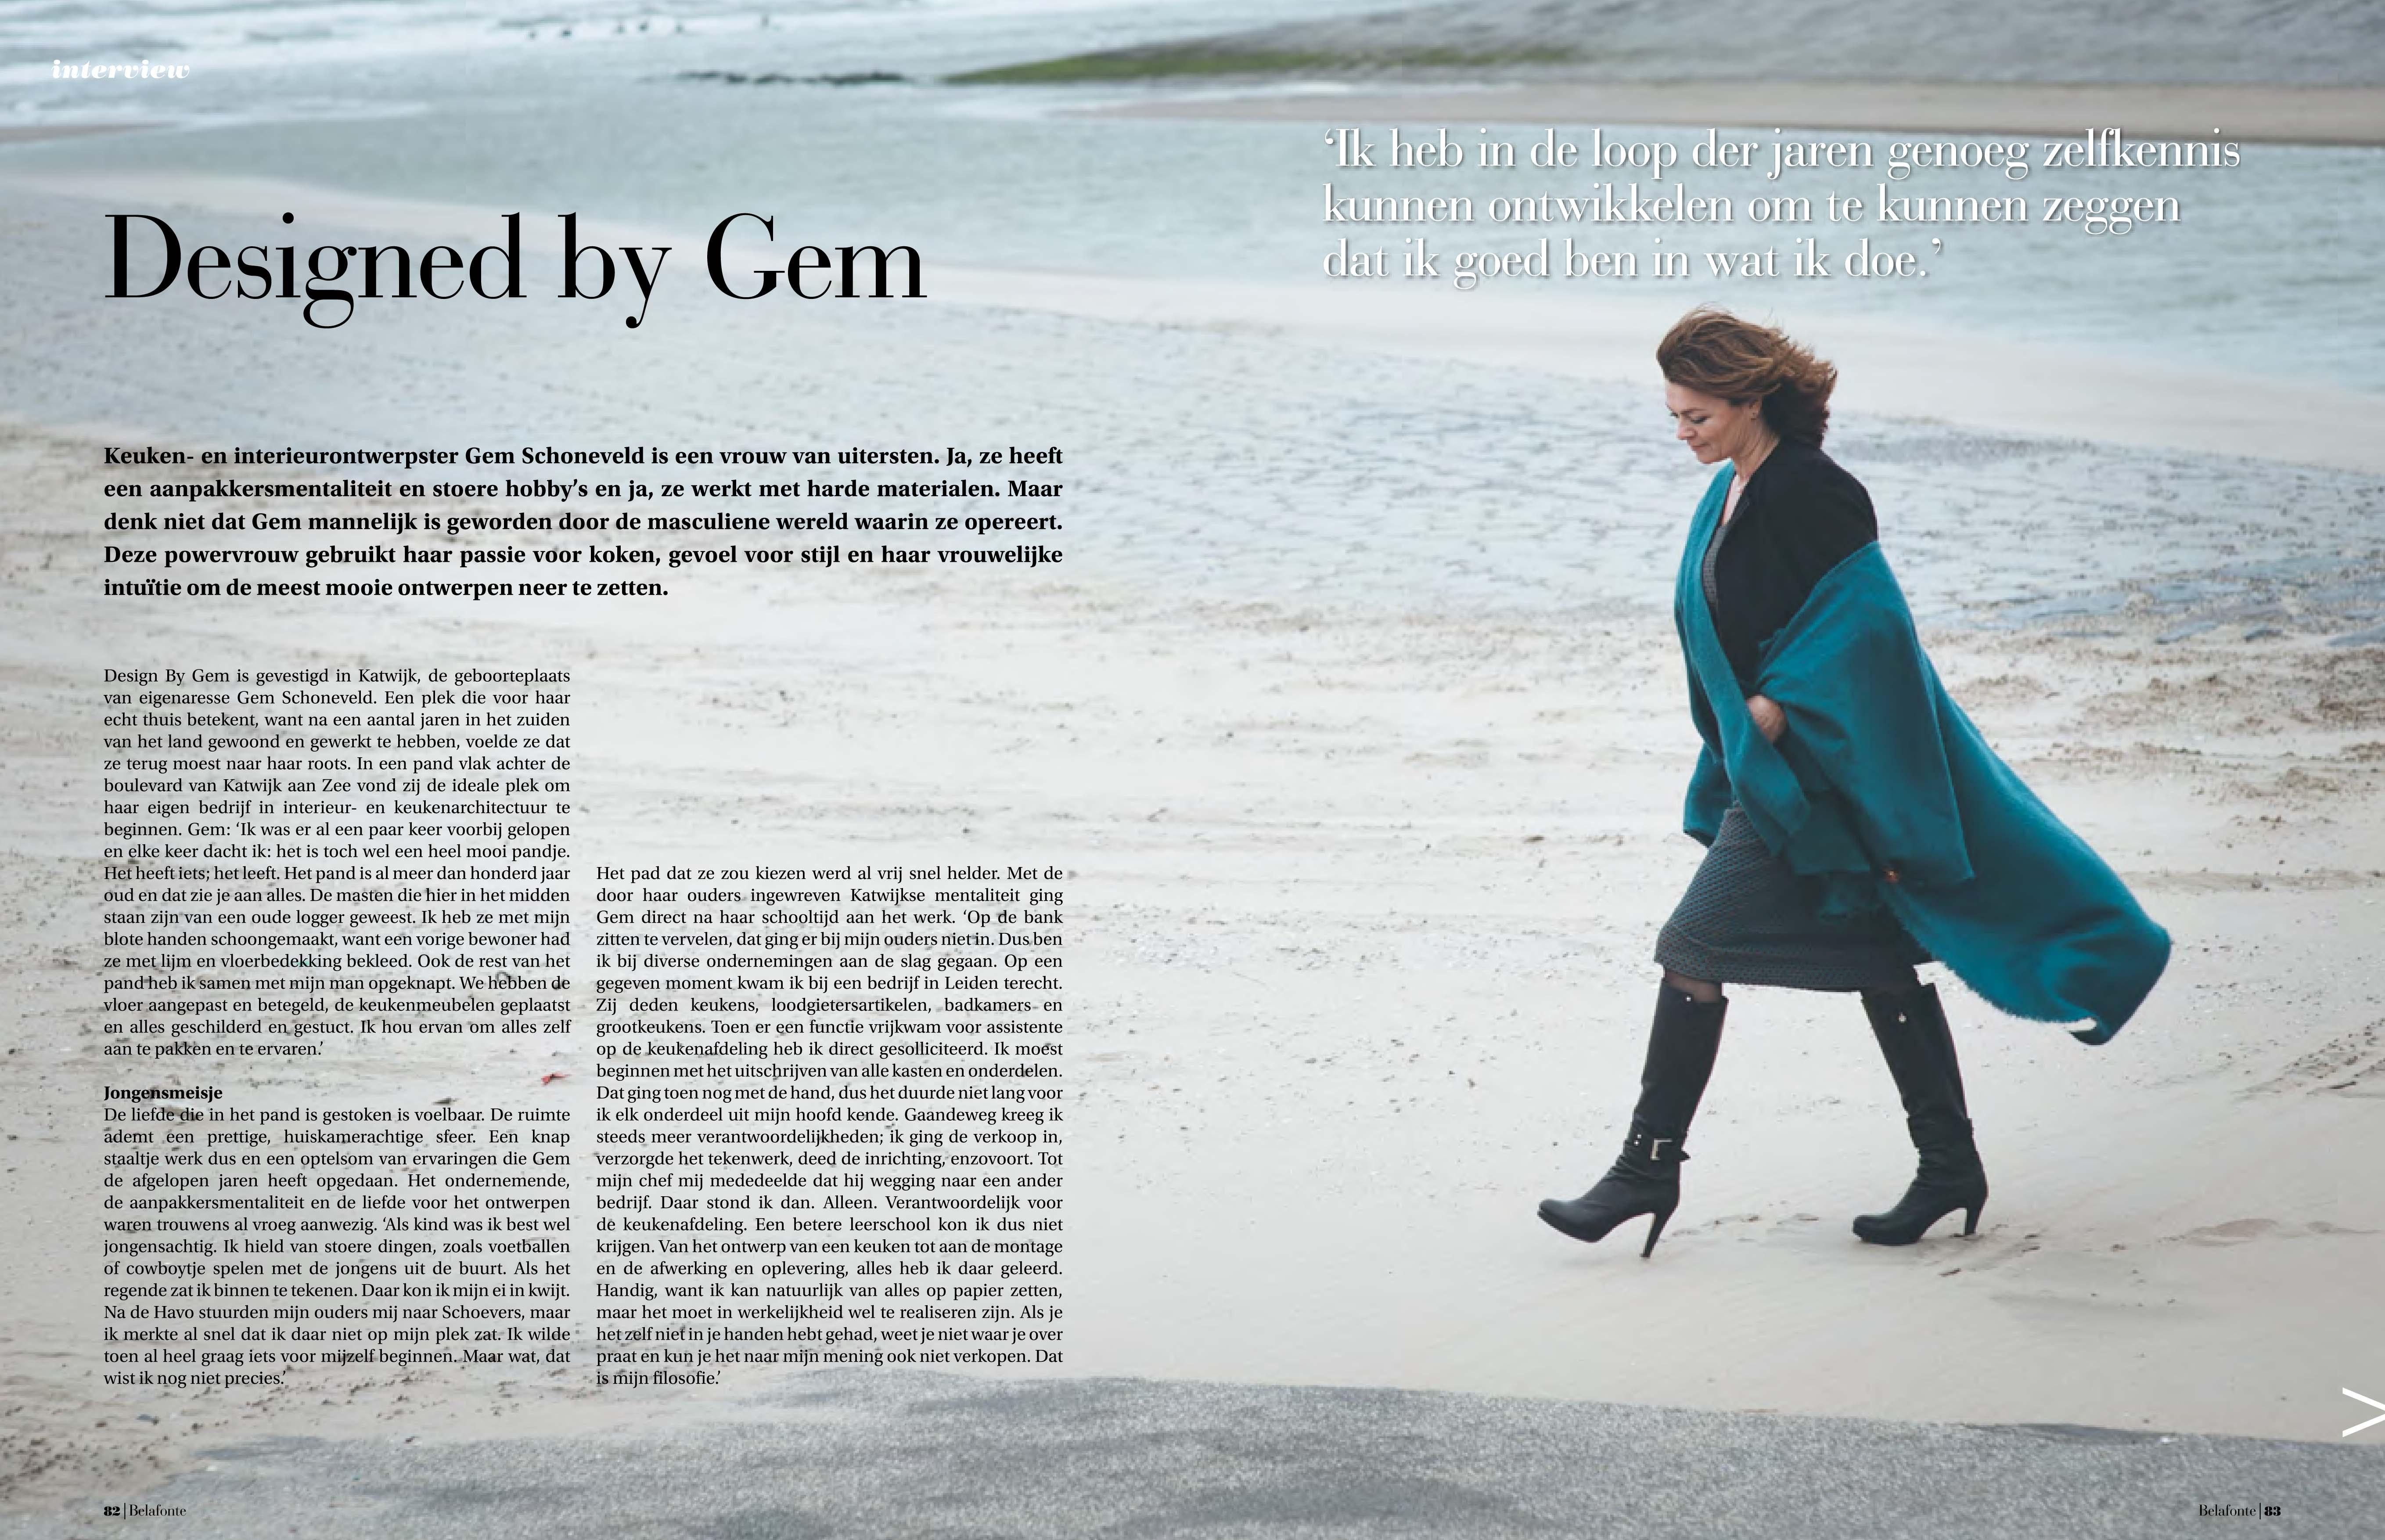 Designed by Gem | Belafonte Luxury Magazine